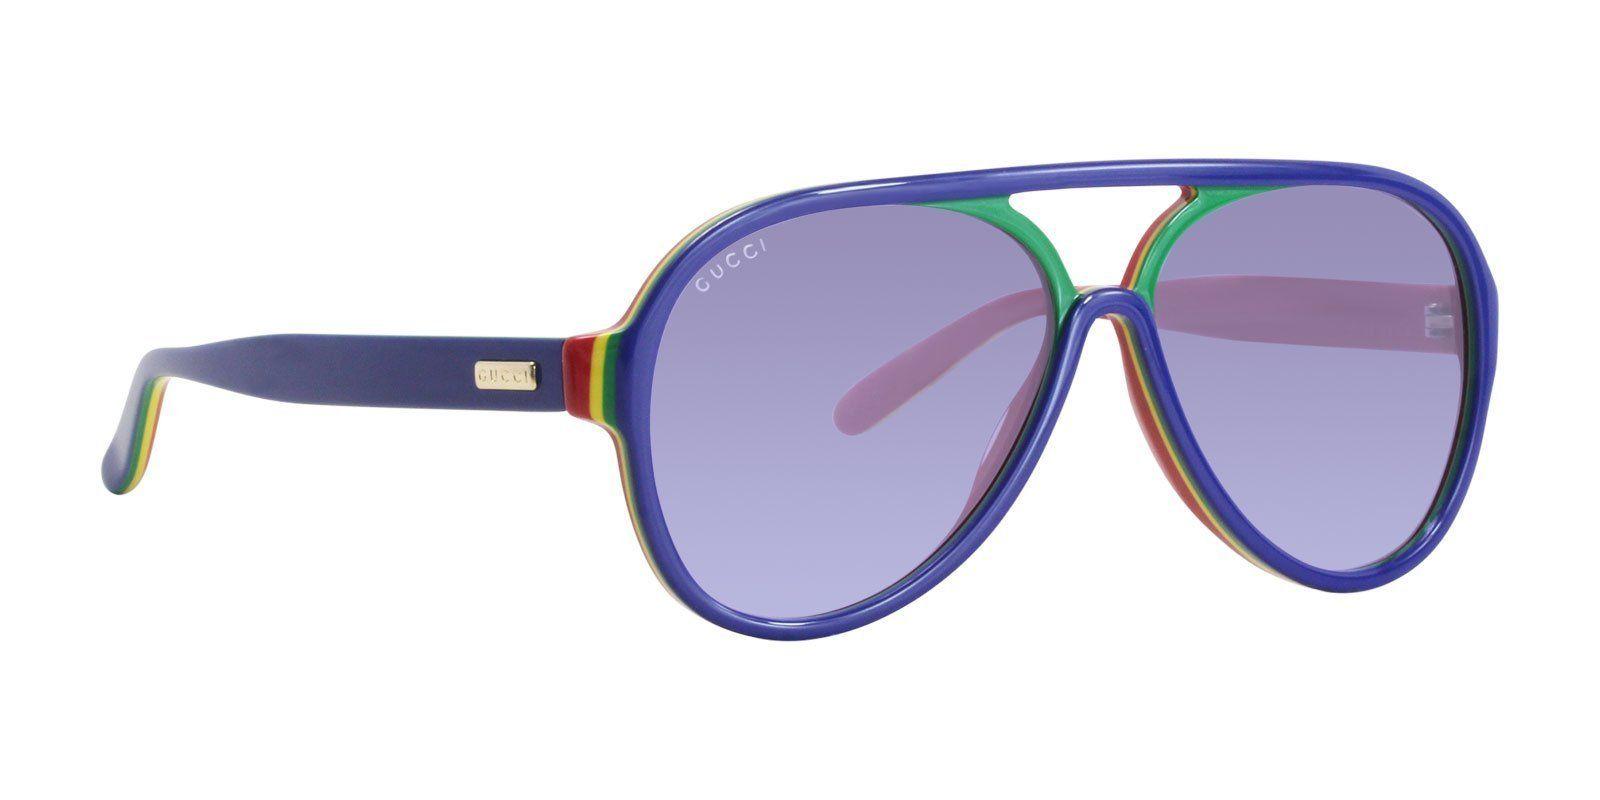 46f0dd60d8d Gucci - GG0270S 007-sunglasses-Designer Eyes